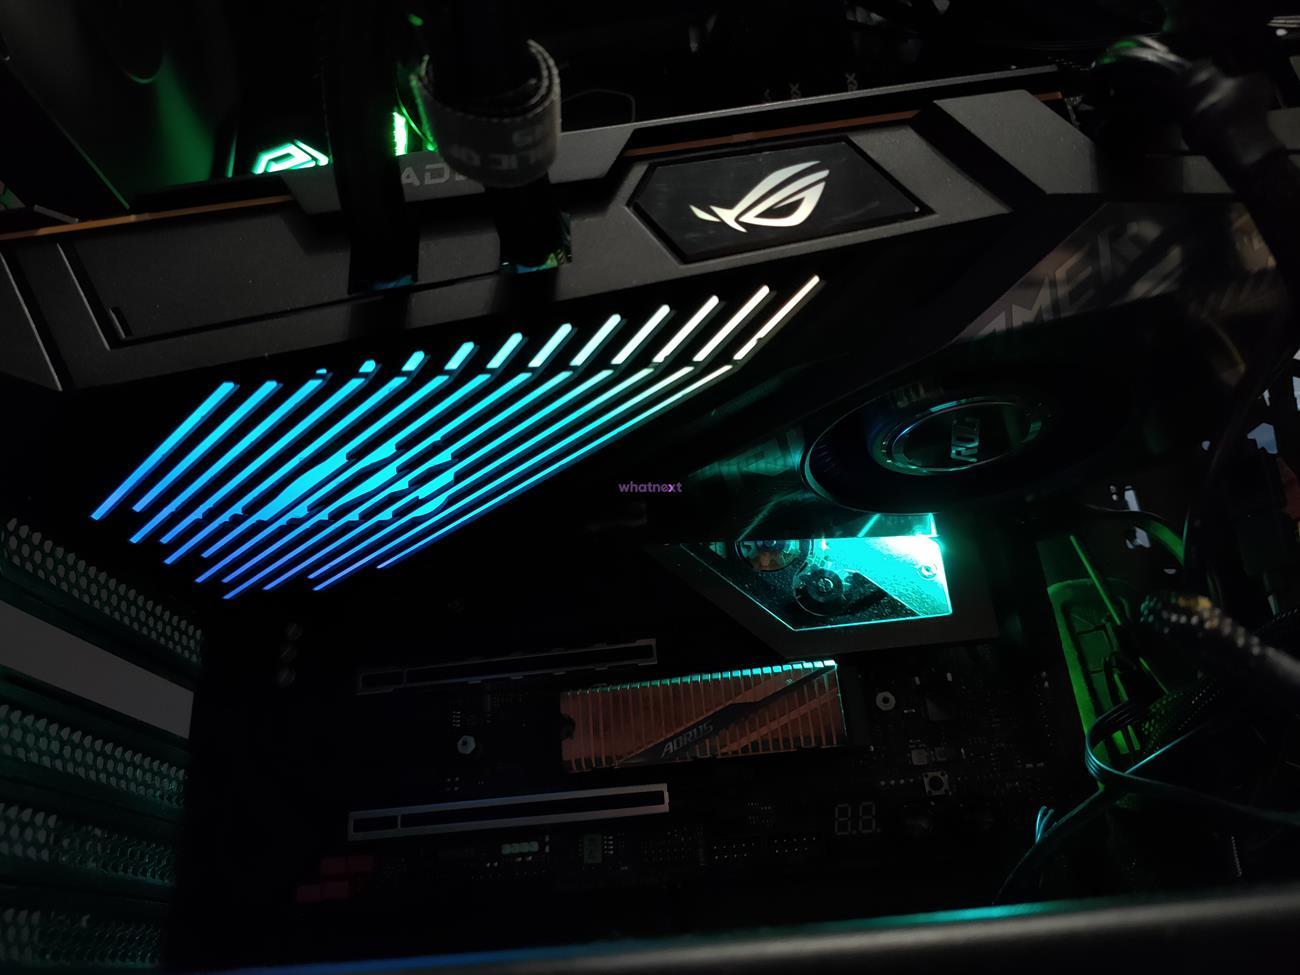 test Asus Radeon RX 6800 XT ROG Strix LC OC, recenzja Asus Radeon RX 6800 XT ROG Strix LC OC, review Asus Radeon RX 6800 XT ROG Strix LC OC, opinia Asus Radeon RX 6800 XT ROG Strix LC OC